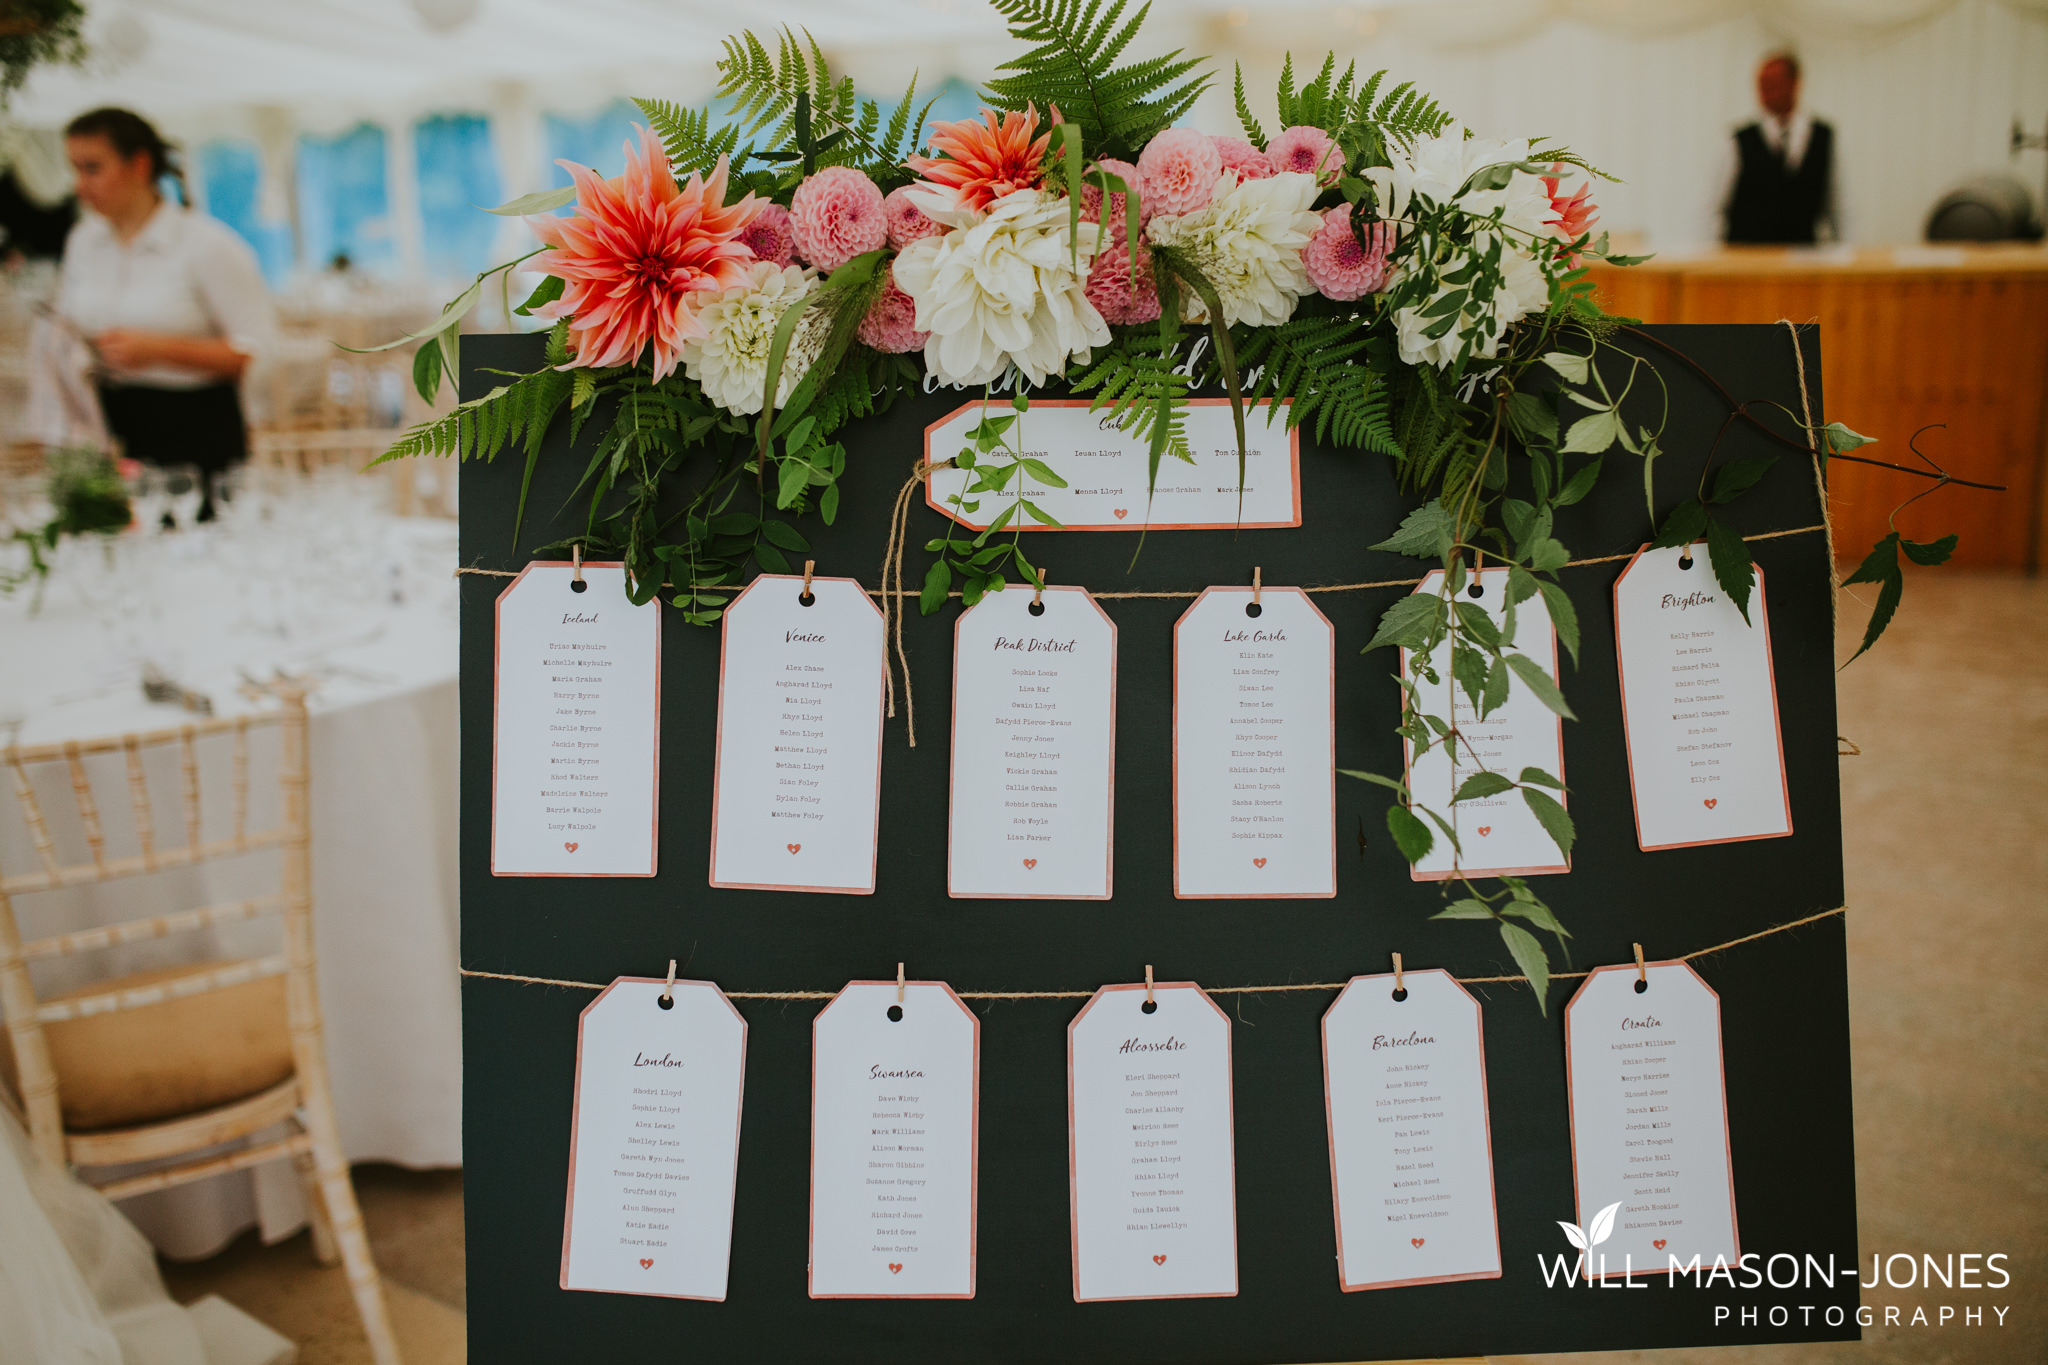 plas-glansevin-wet-carmarthen-swansea-wedding-photographers-natural-relaxed-1.jpg